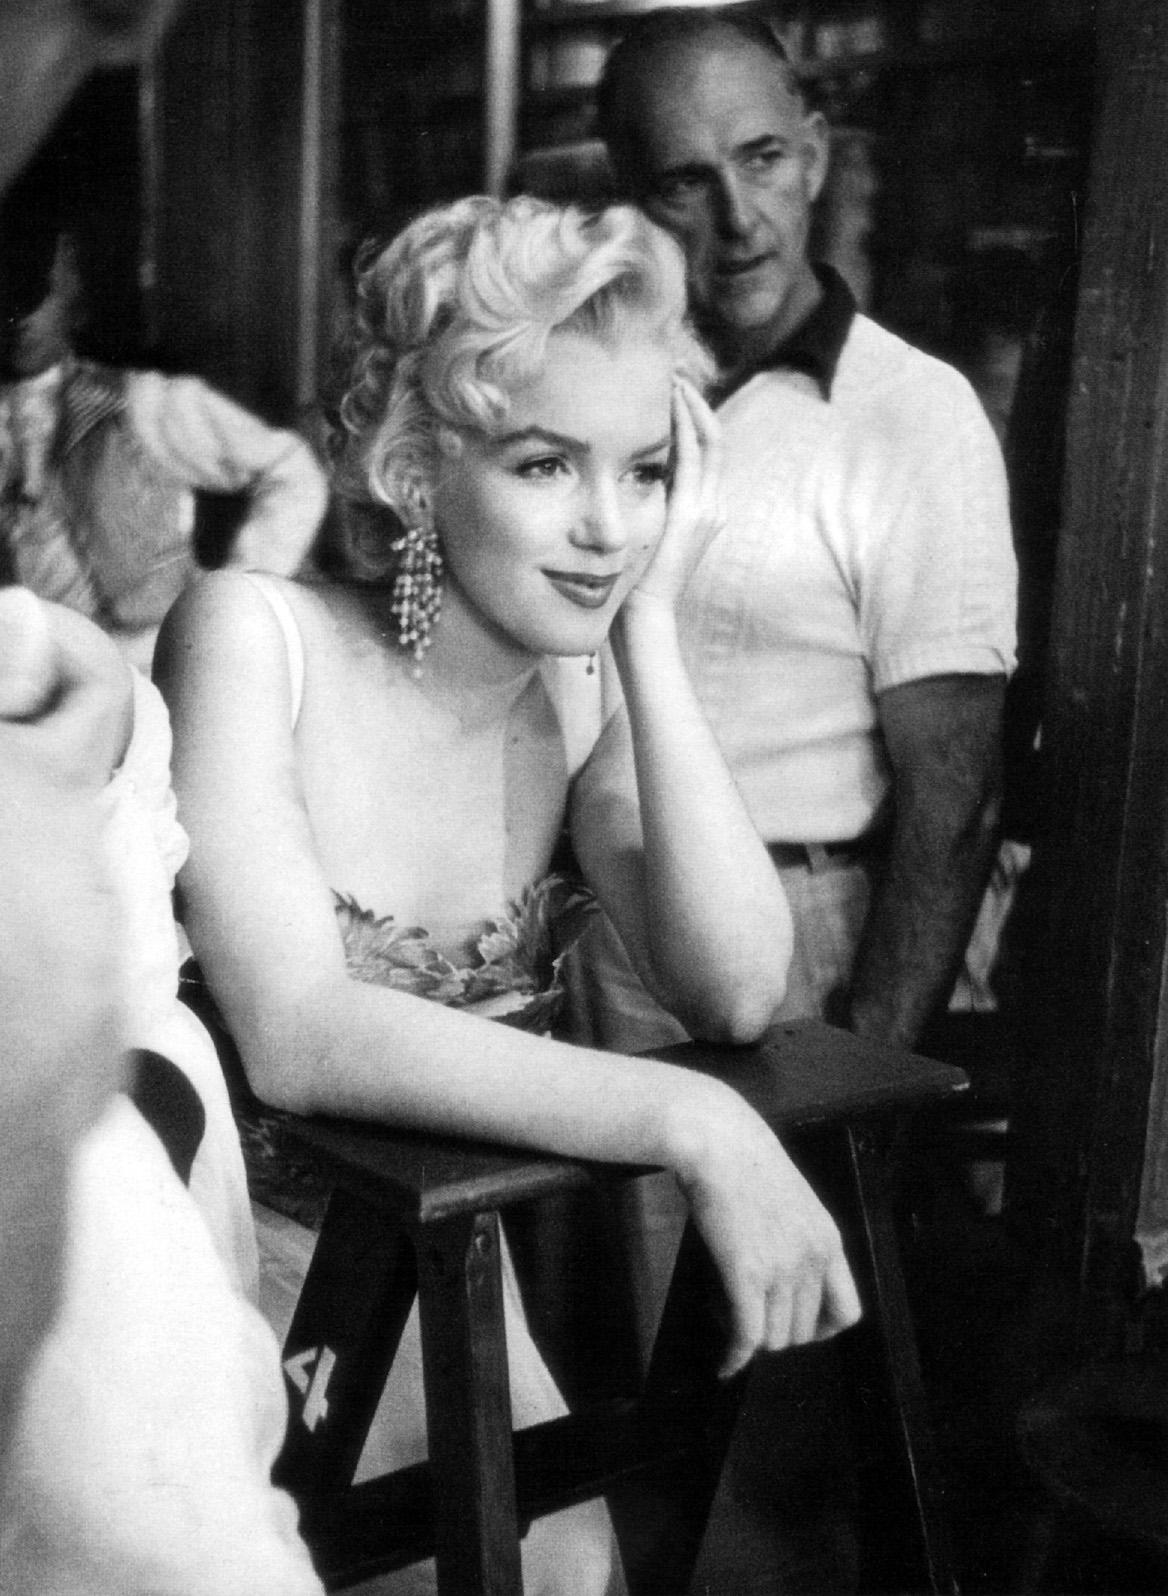 Marilyn Monroe Living Room Decor: The Man Cave: Marilyn Monroe